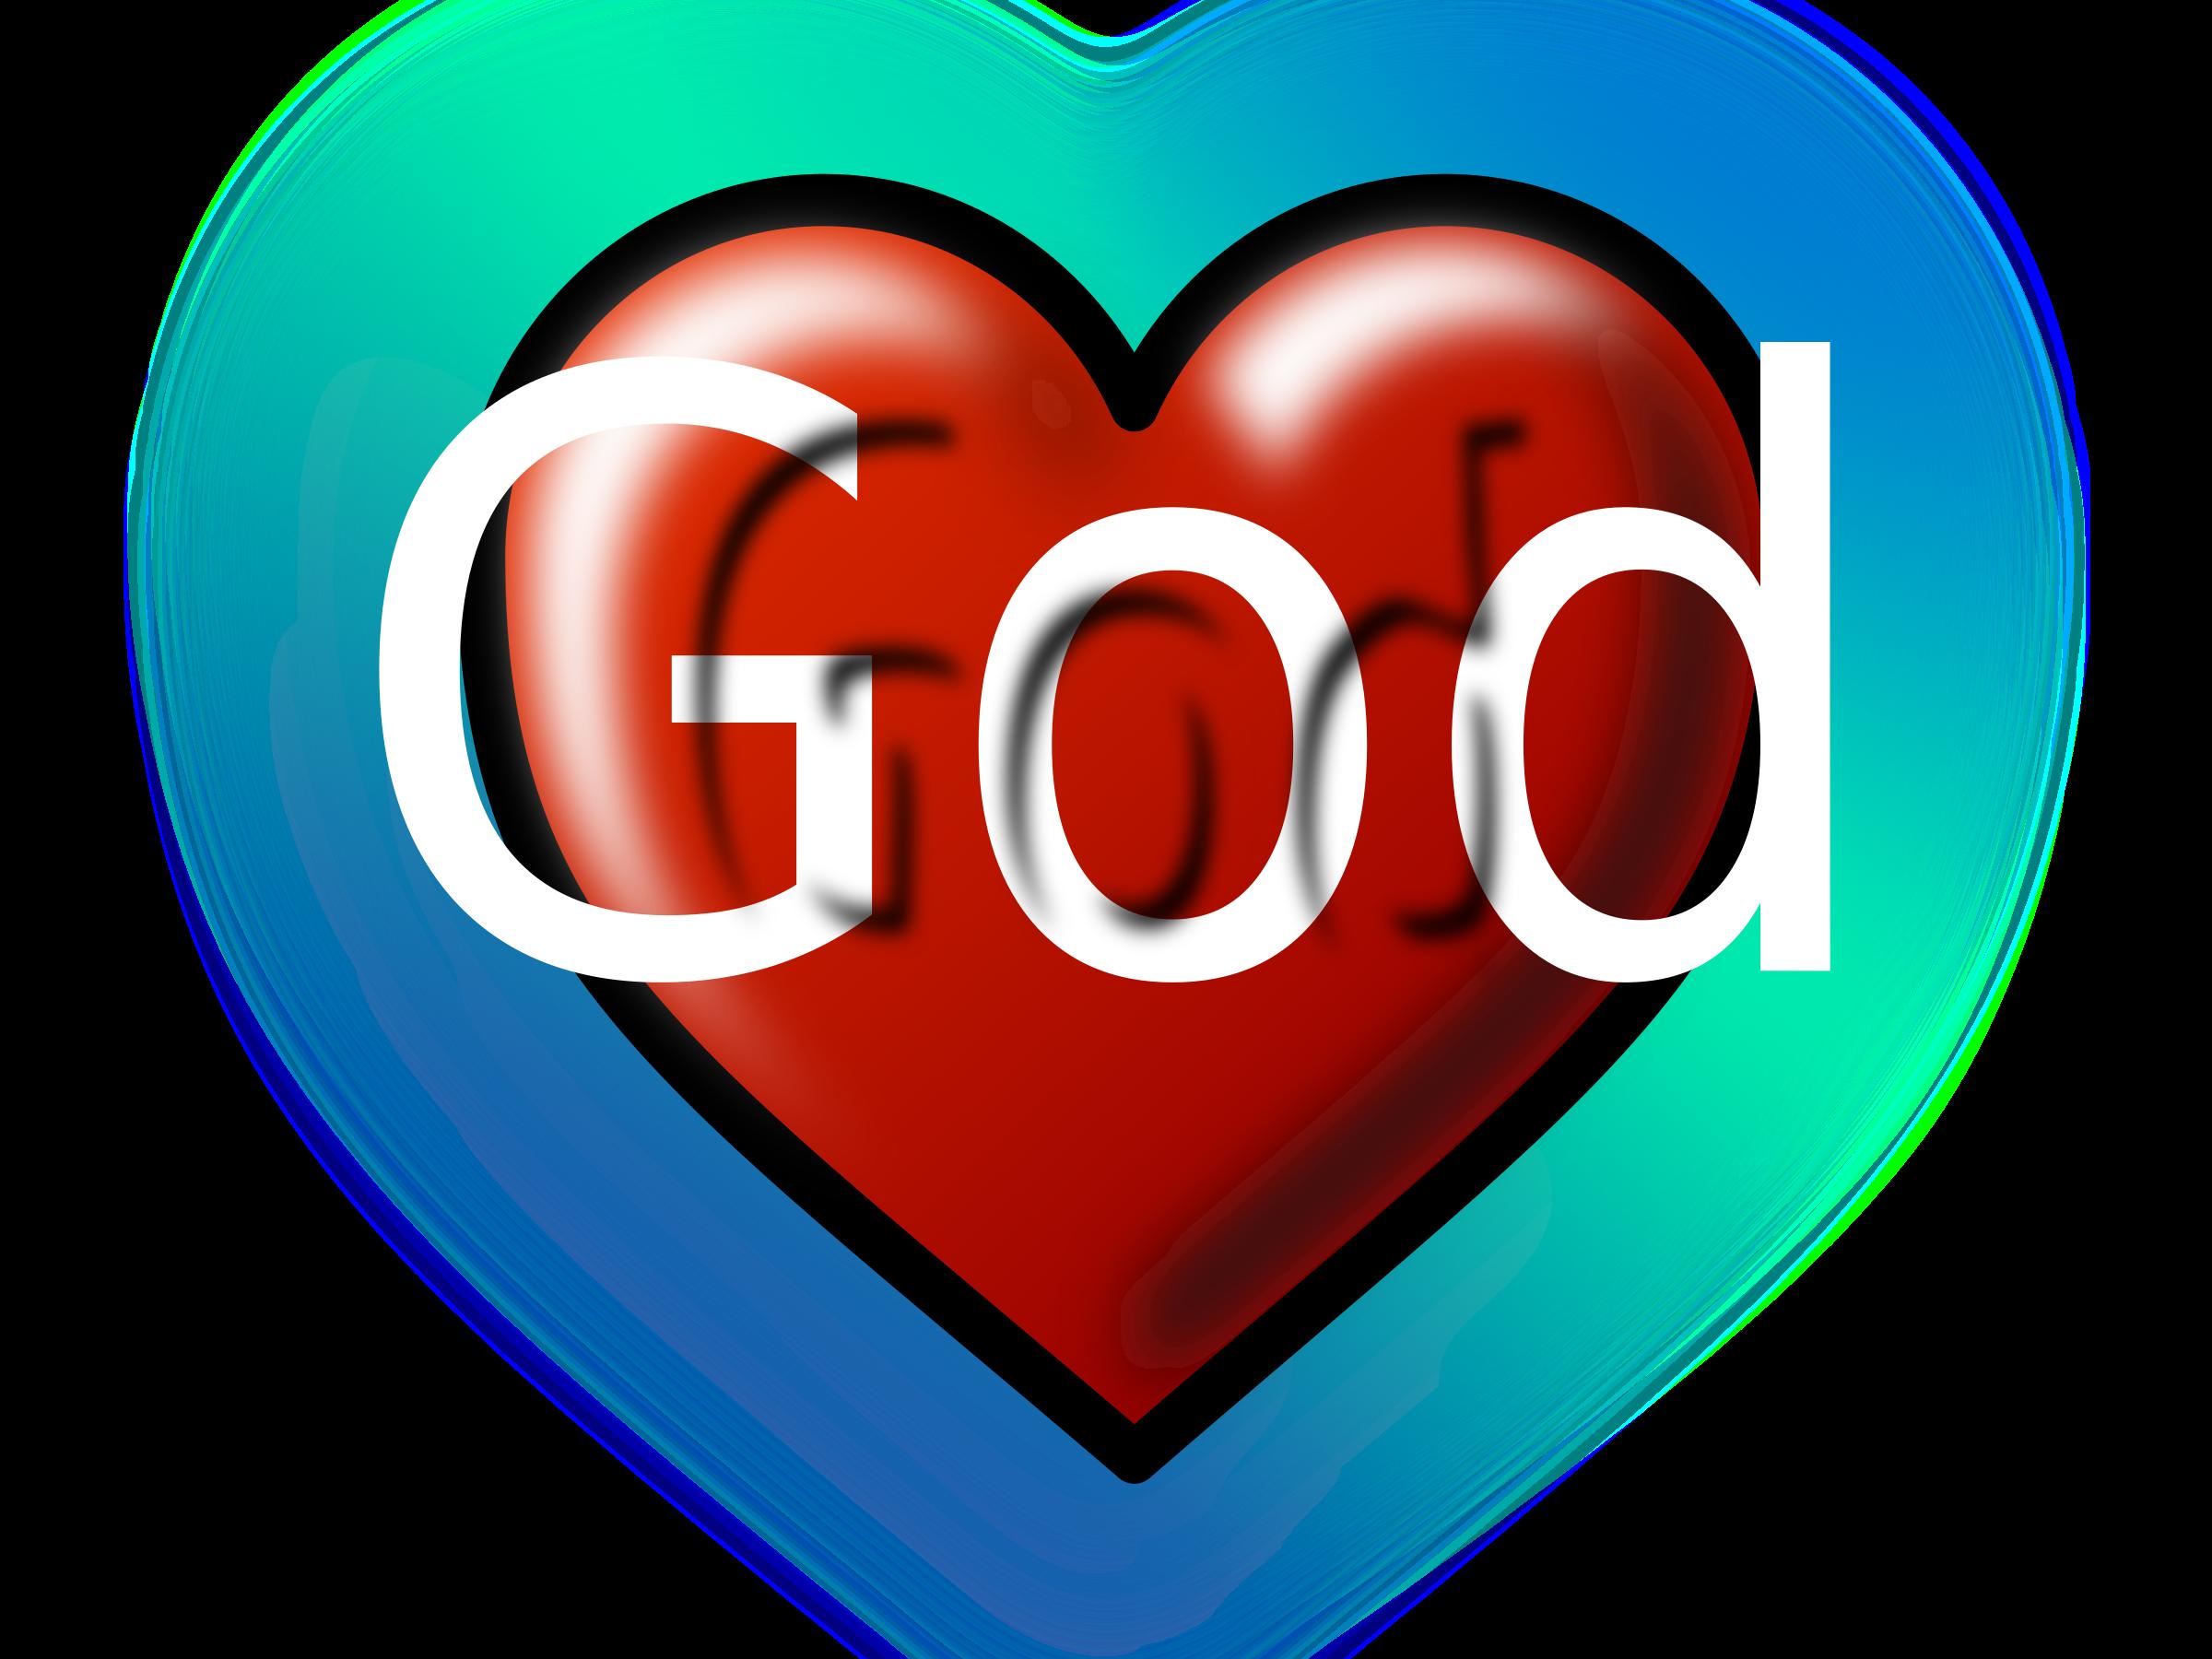 Editable text big image. God clipart heart